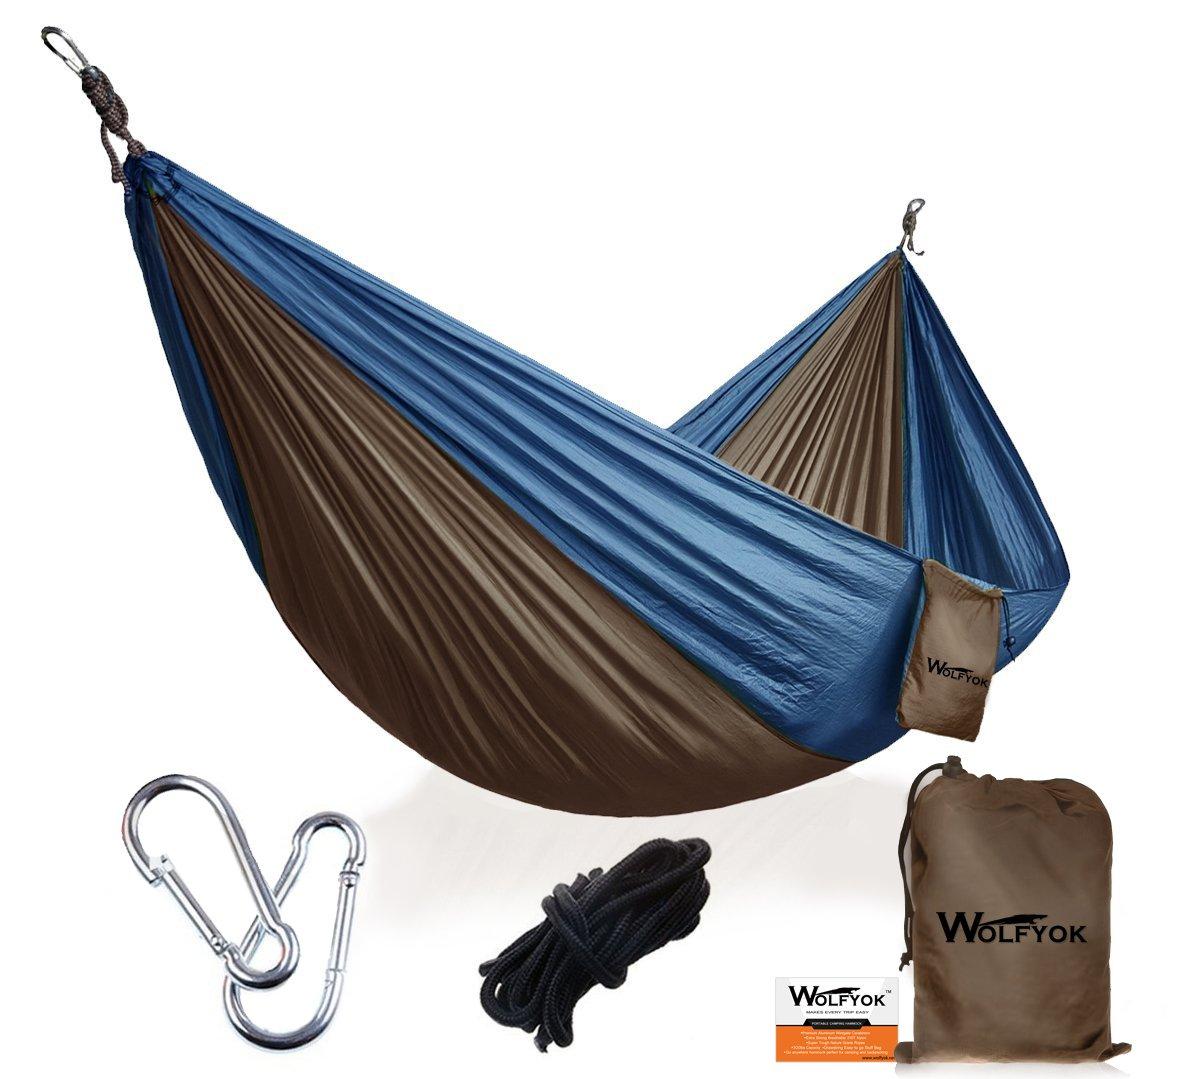 portable camping hammock lightweight nylon parachute outdoor hammock  portable camping hammock lightweight nylon parachute outdoor      rh   ebay